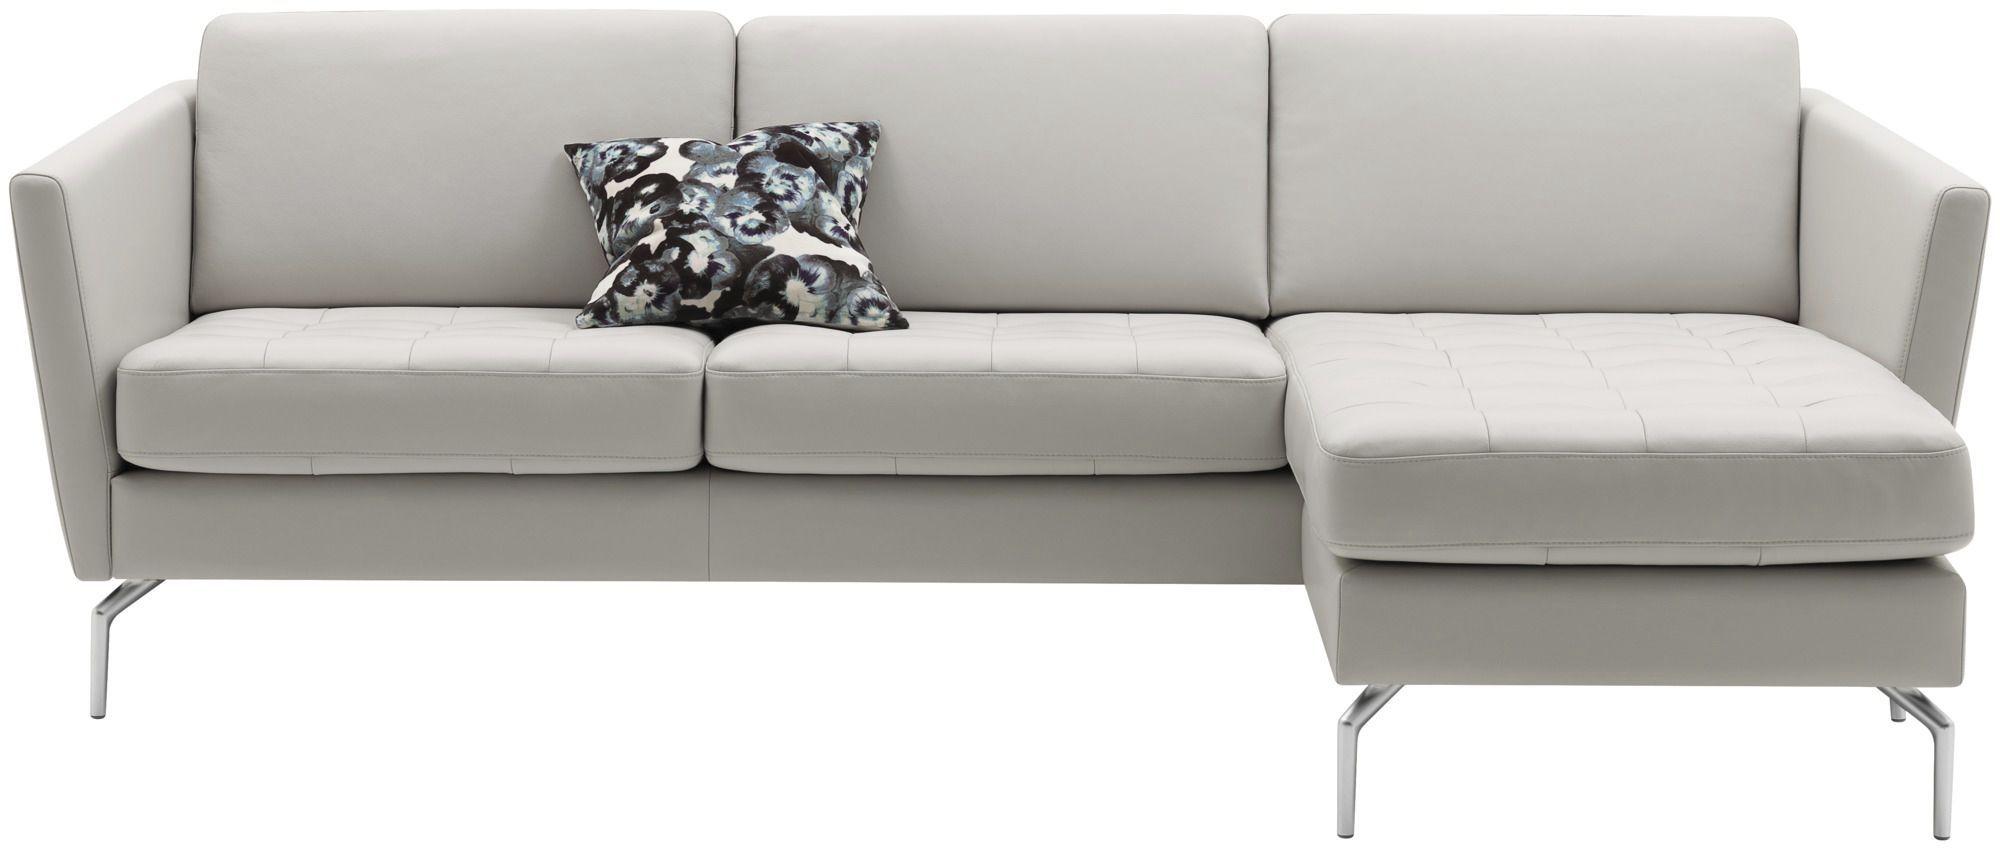 Wunderbar Hellblaues Sofa Galerie Von Ecksofa / Modern / Leder / Stoff